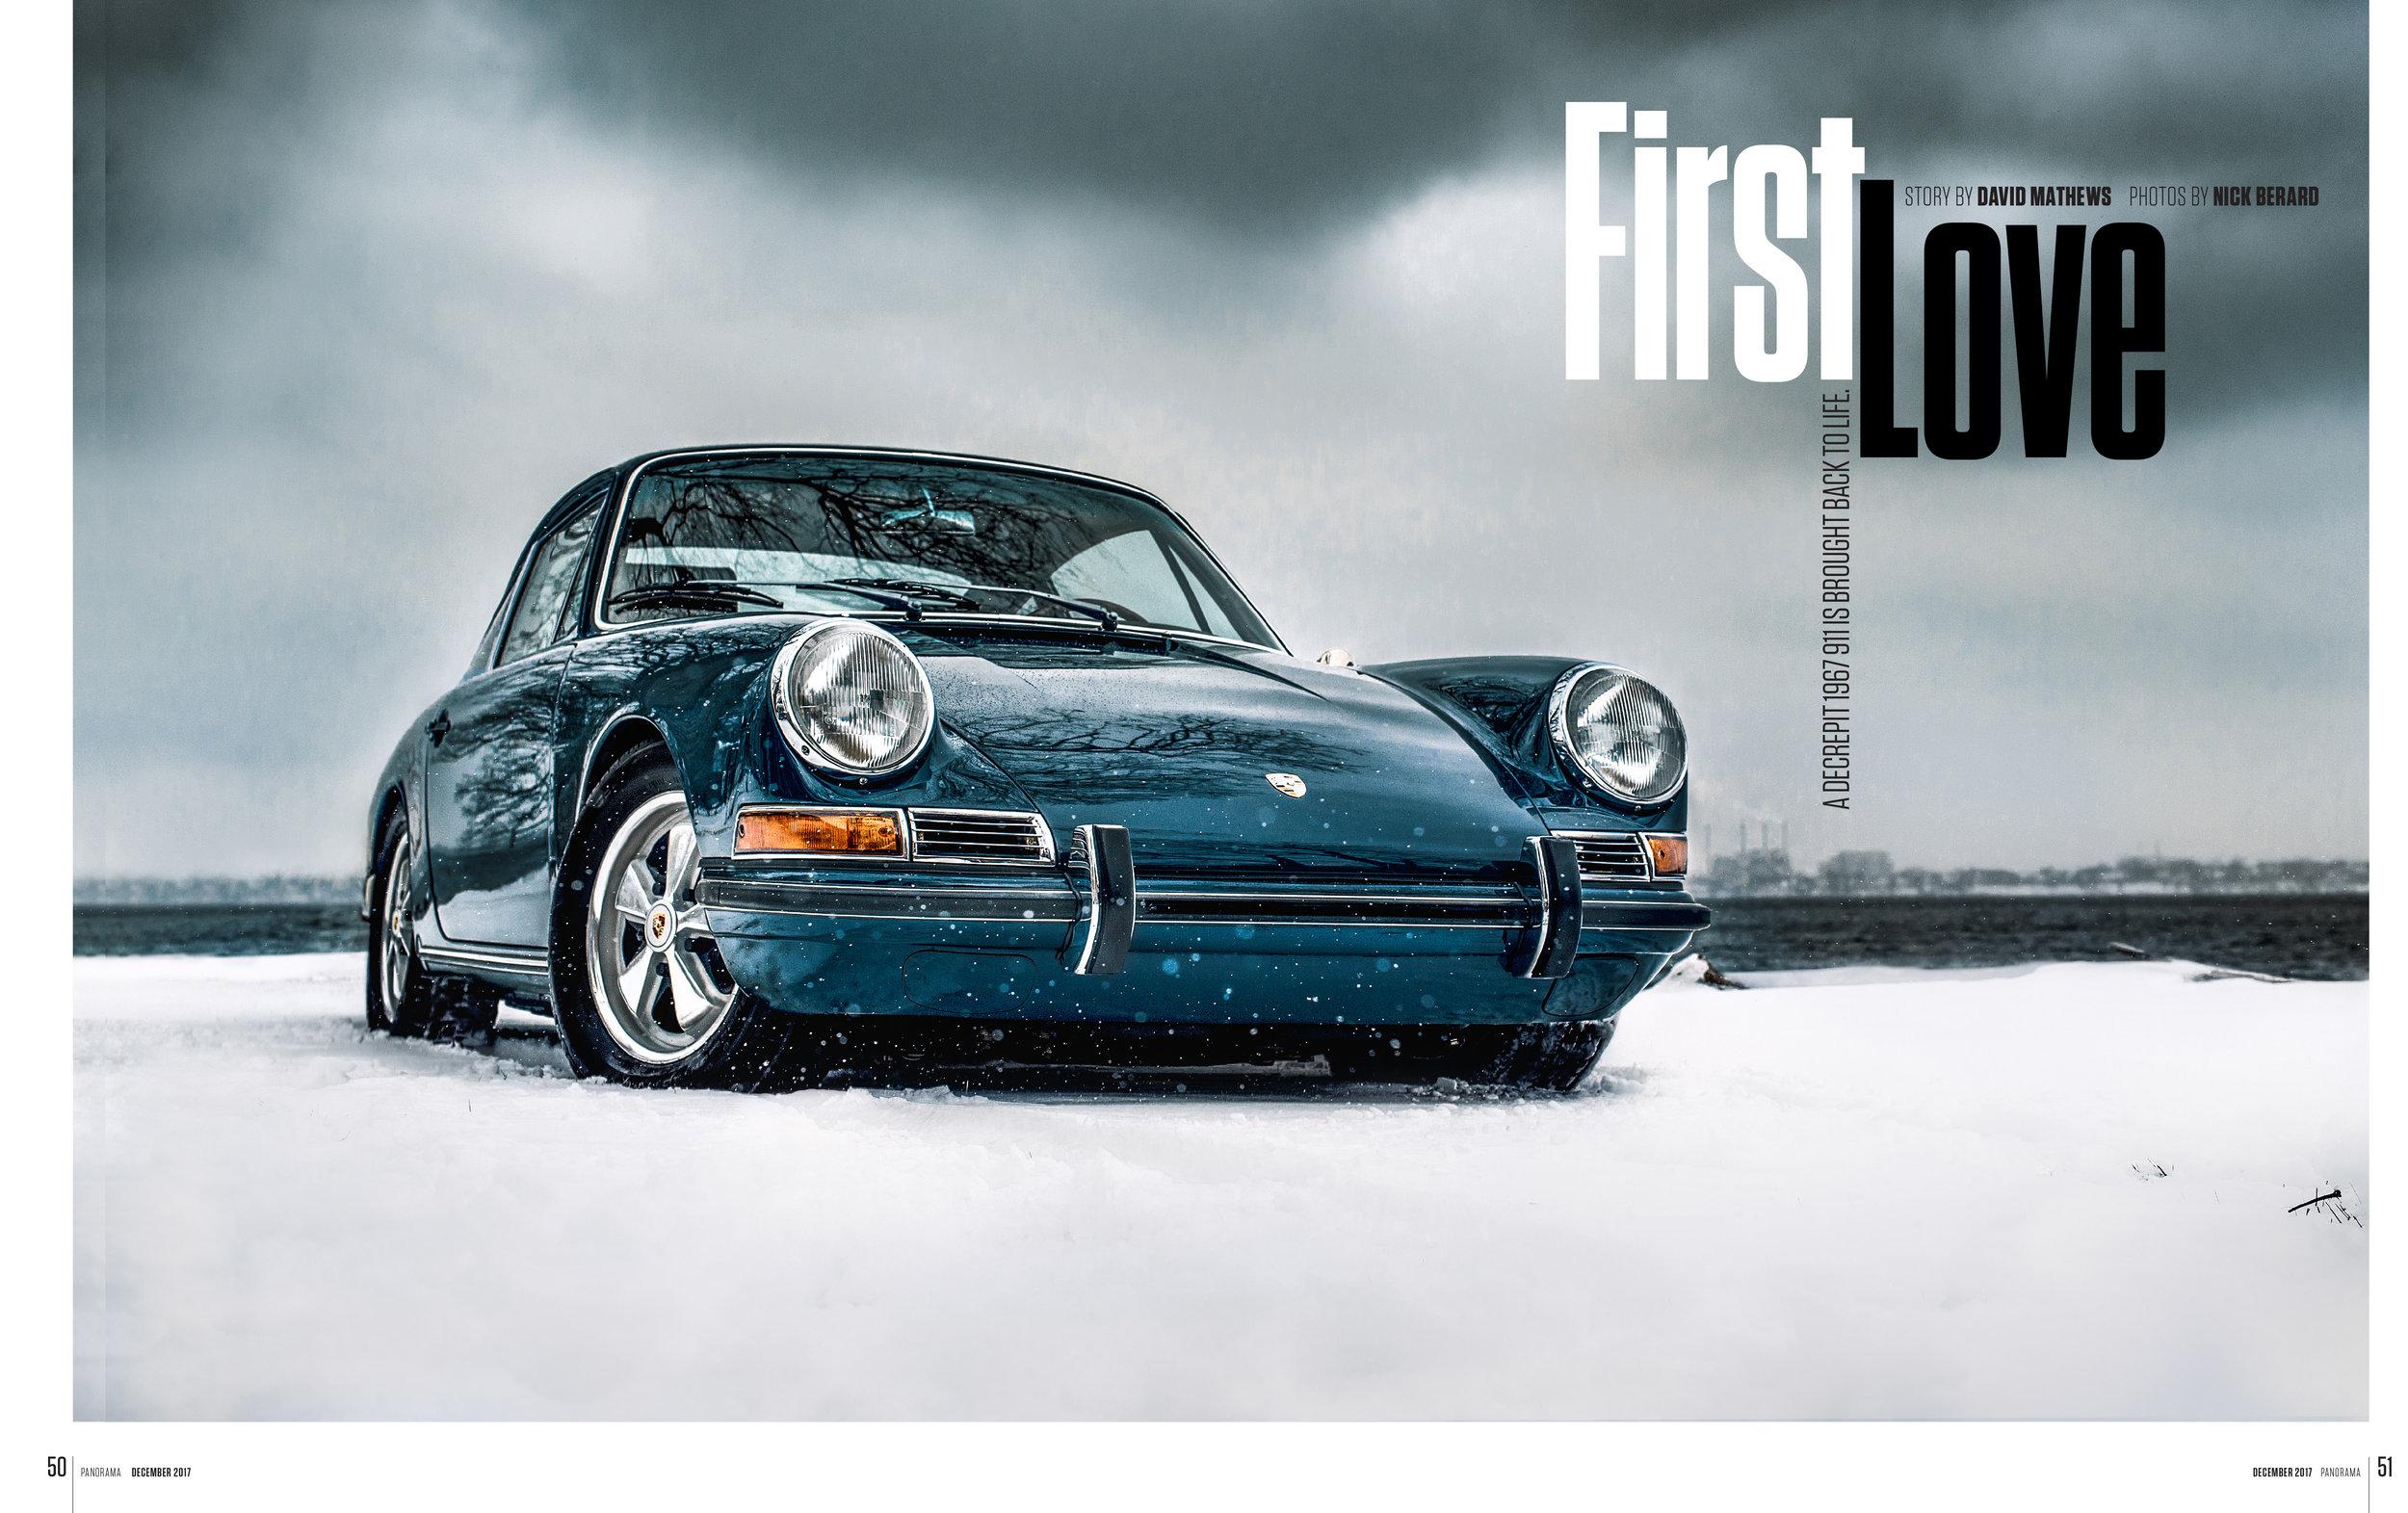 Porsche Panorama - First Love - FULL ARTICLE